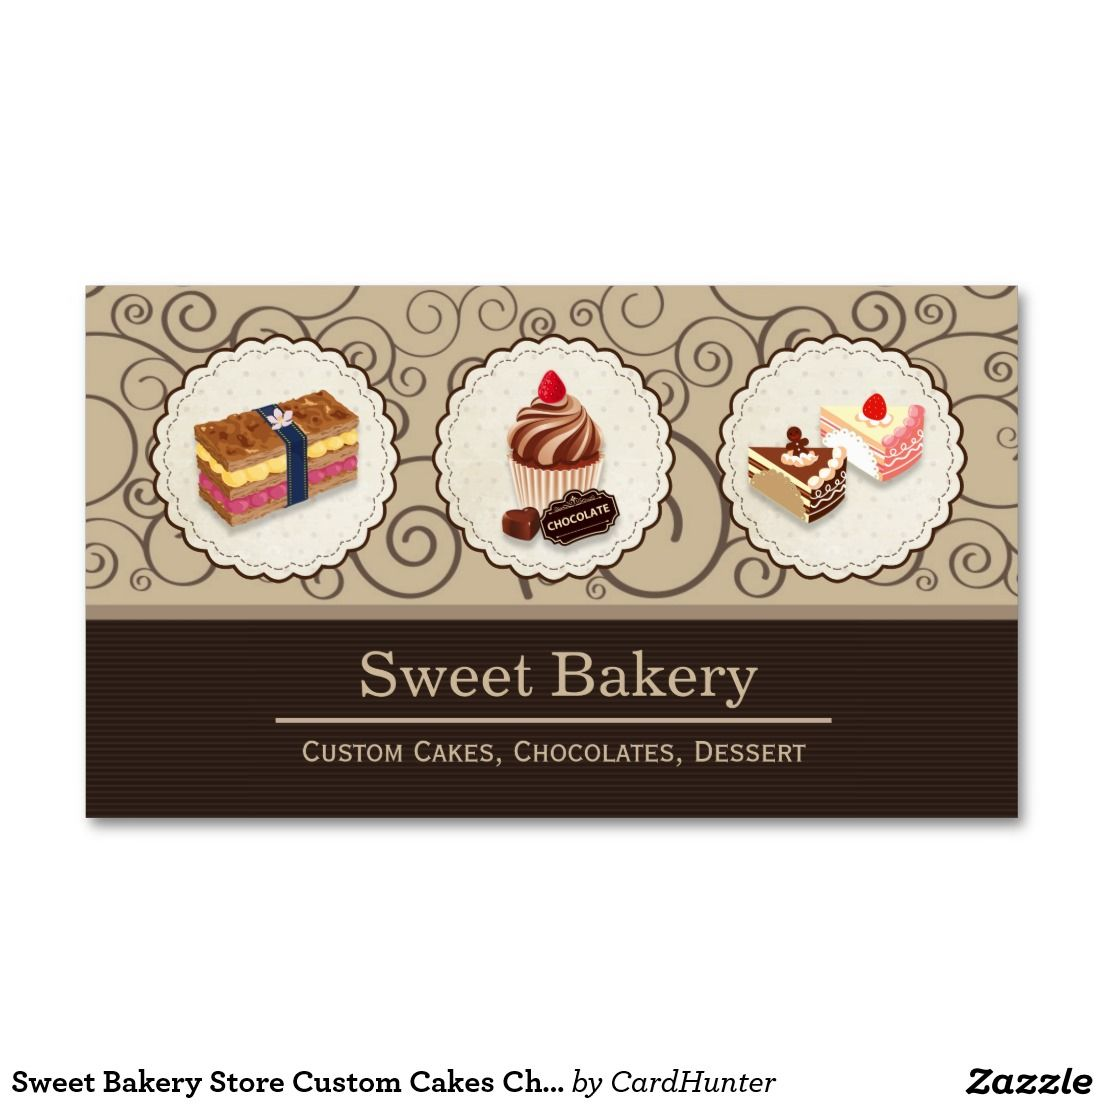 Sweet Bakery Store Custom Cakes Chocolates Dessert Double-Sided ...